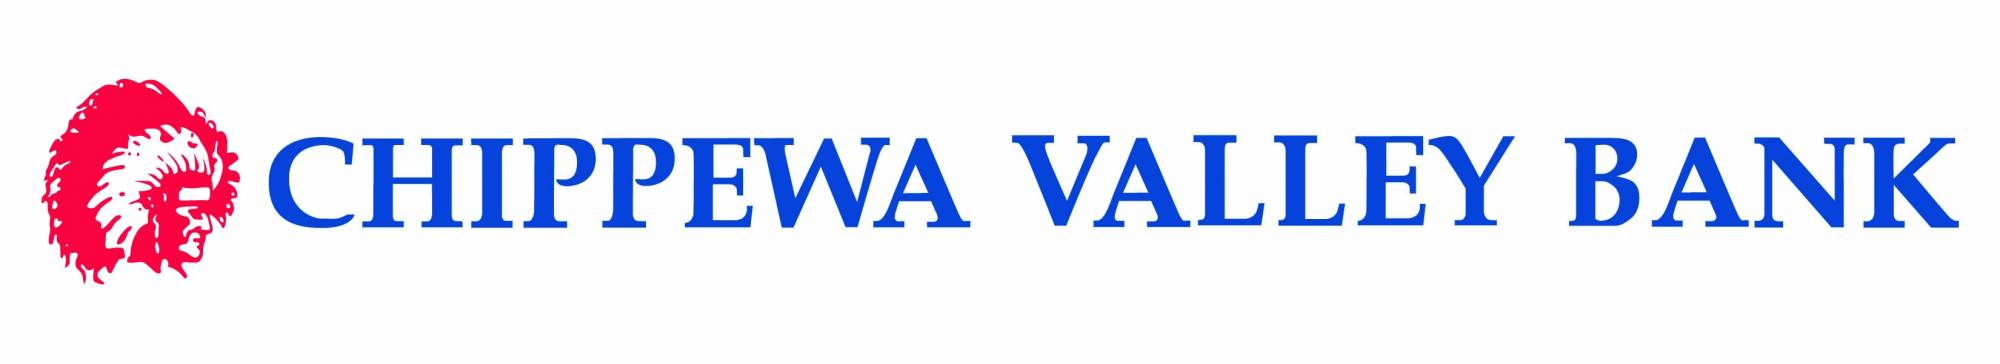 ChippewaValleyBank Logo